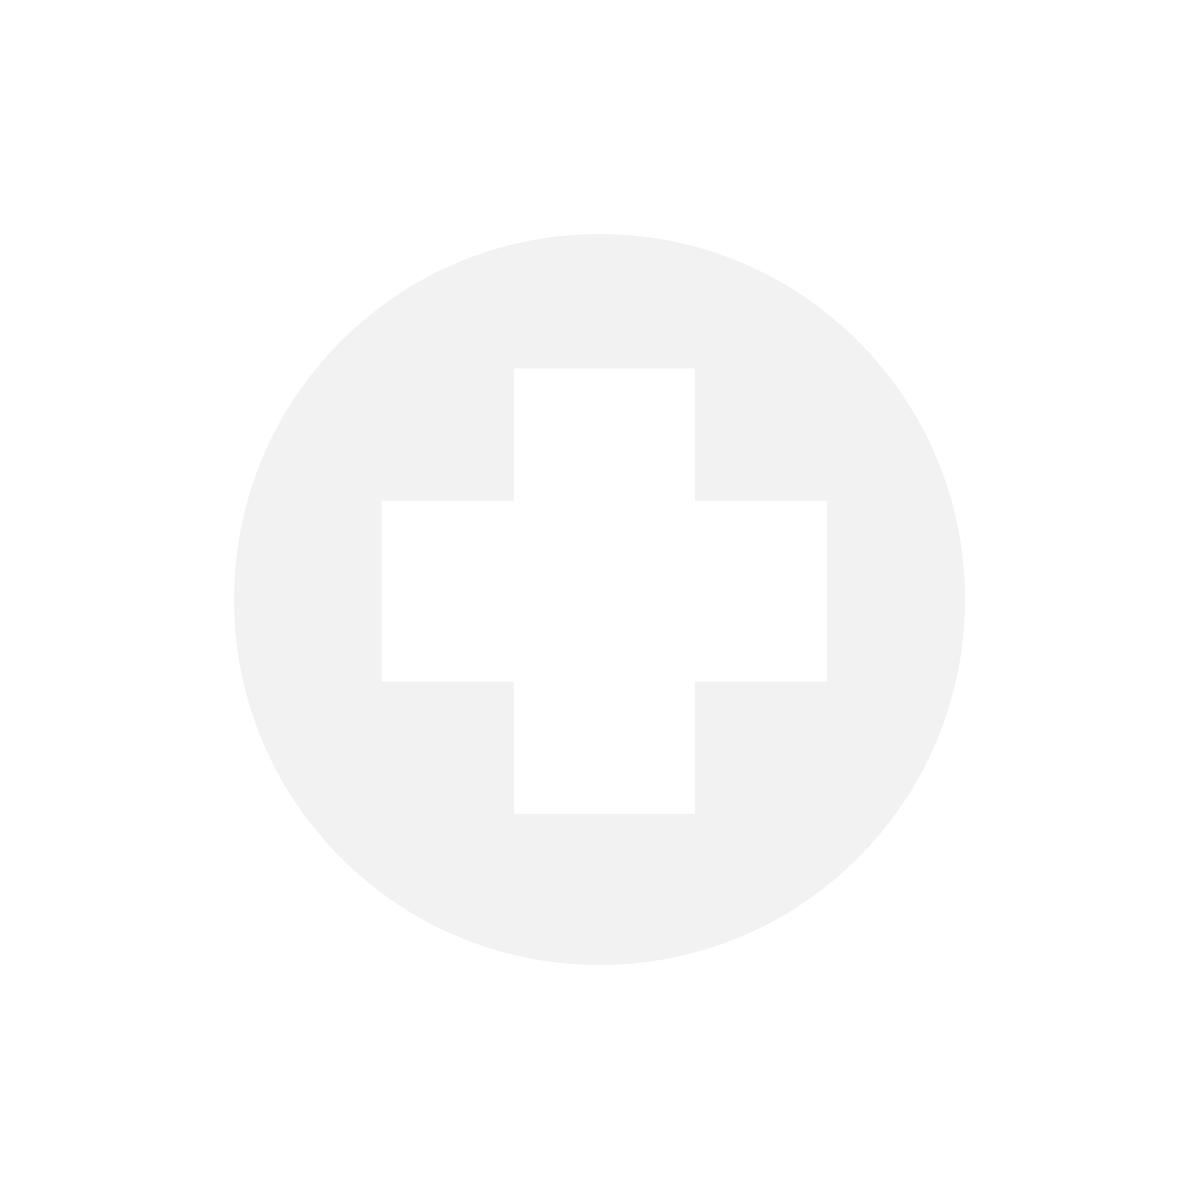 Vessie de Glace - Diam 25 cm